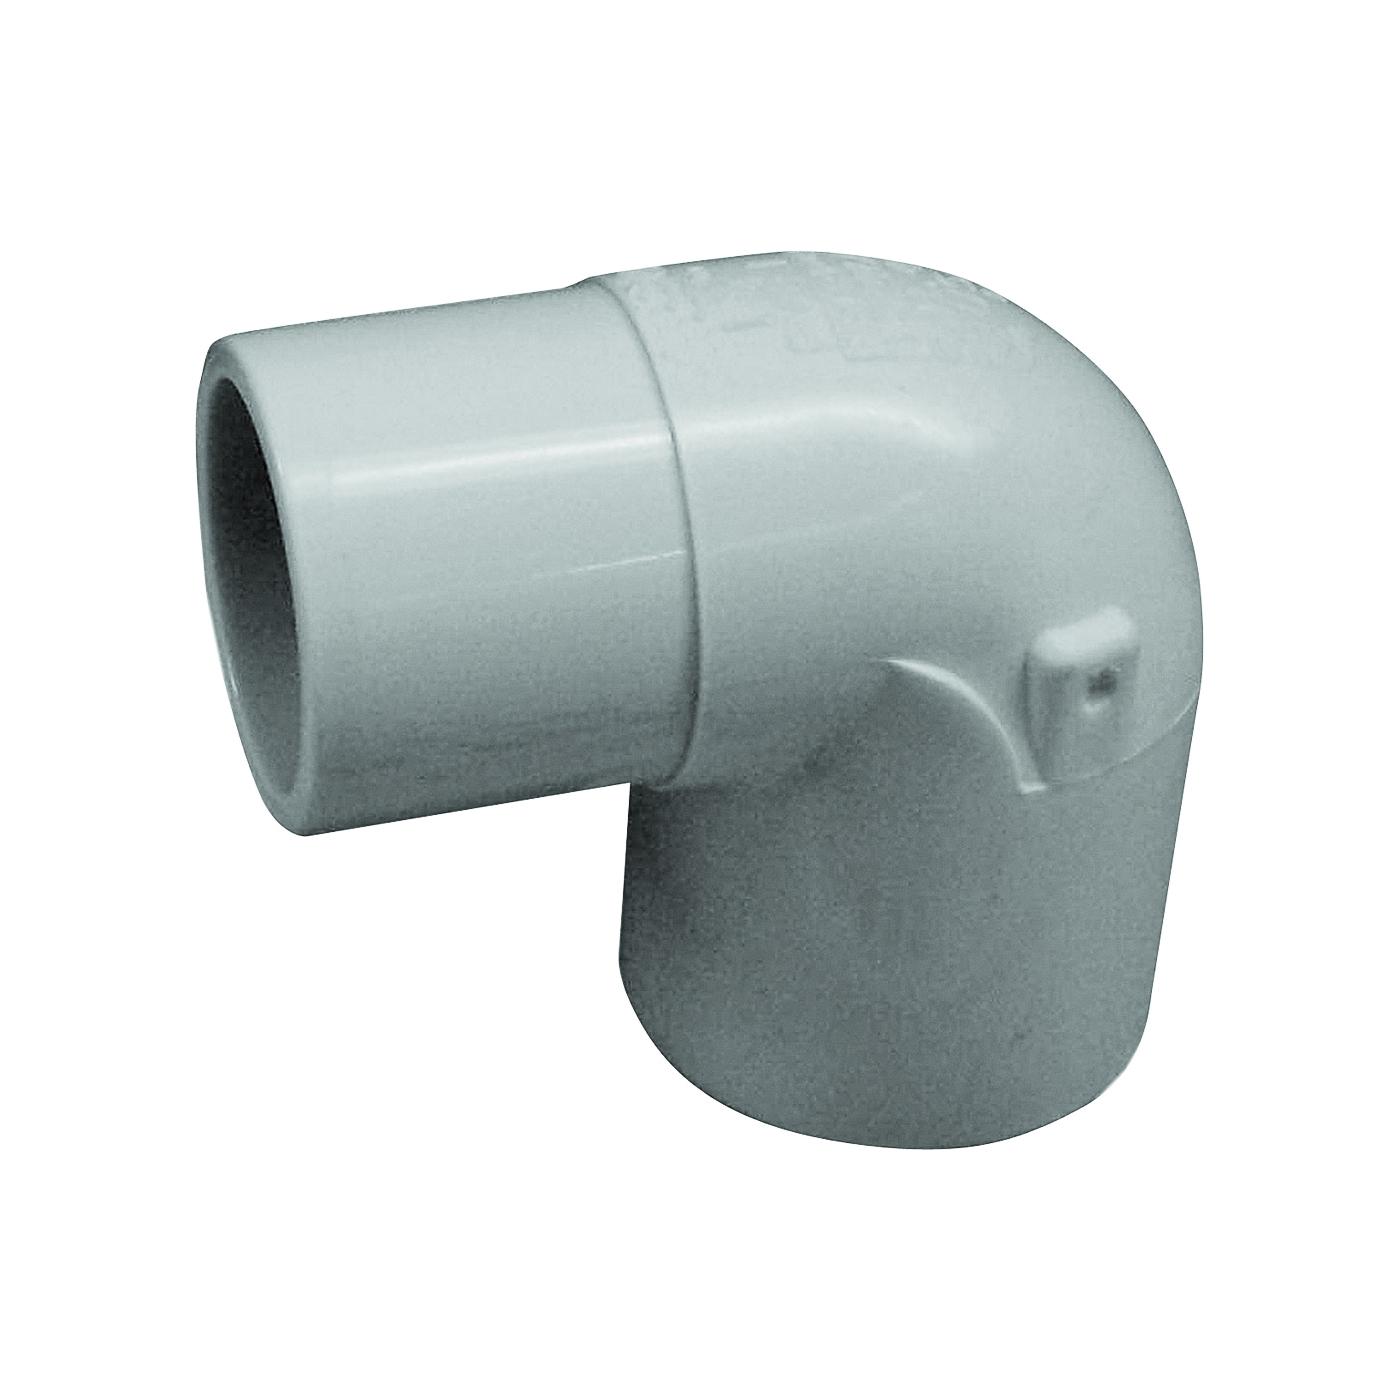 Picture of GENOVA 300 32920 Street Pipe Elbow, 2 in, Slip x Spigot, 90 deg Angle, PVC, White, SCH 40 Schedule